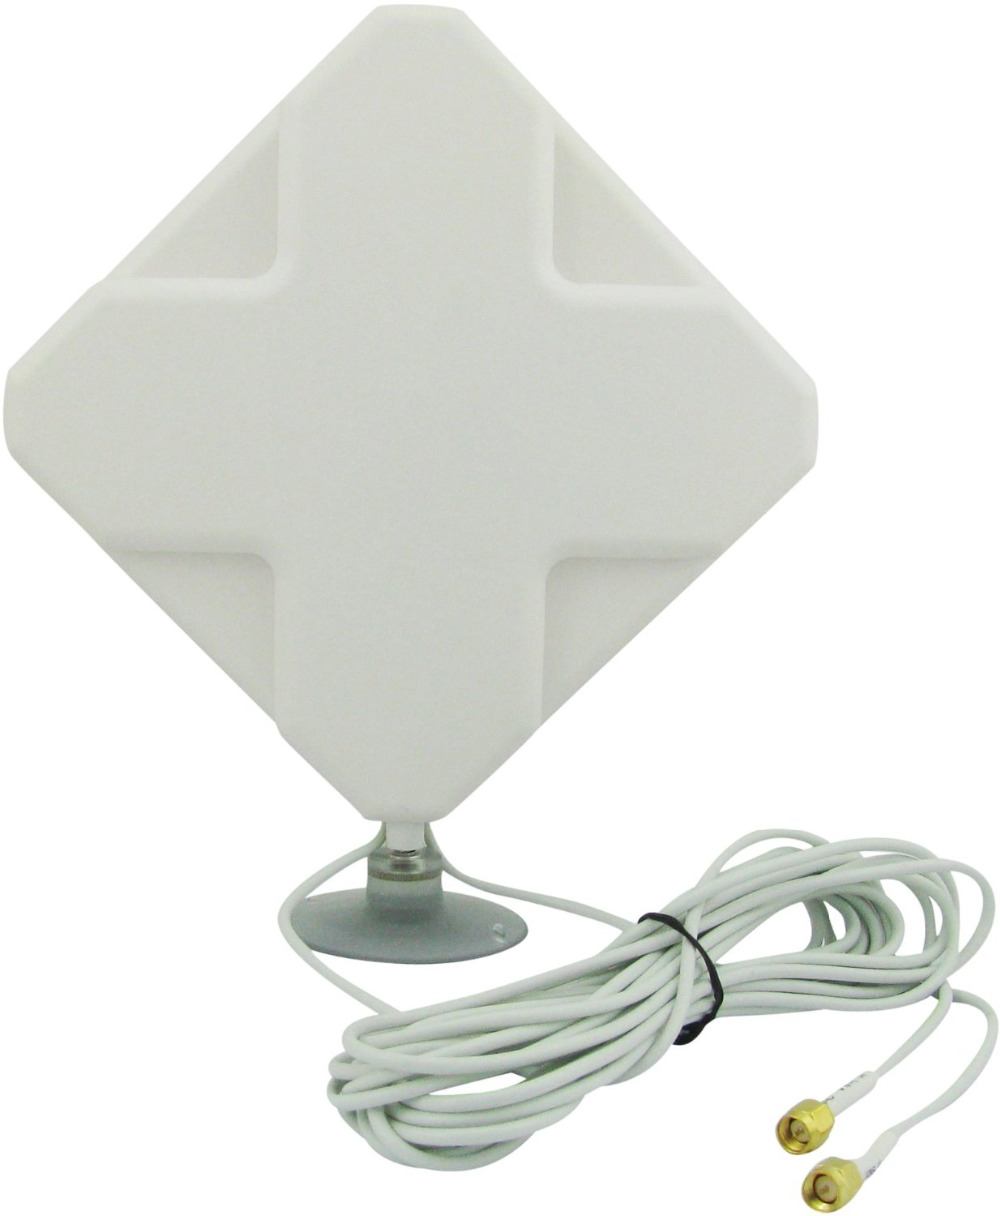 35dBi 3G/4G LTE Long Range Signal Booster Antenna for Mible Hot Spot - Communication Equipment